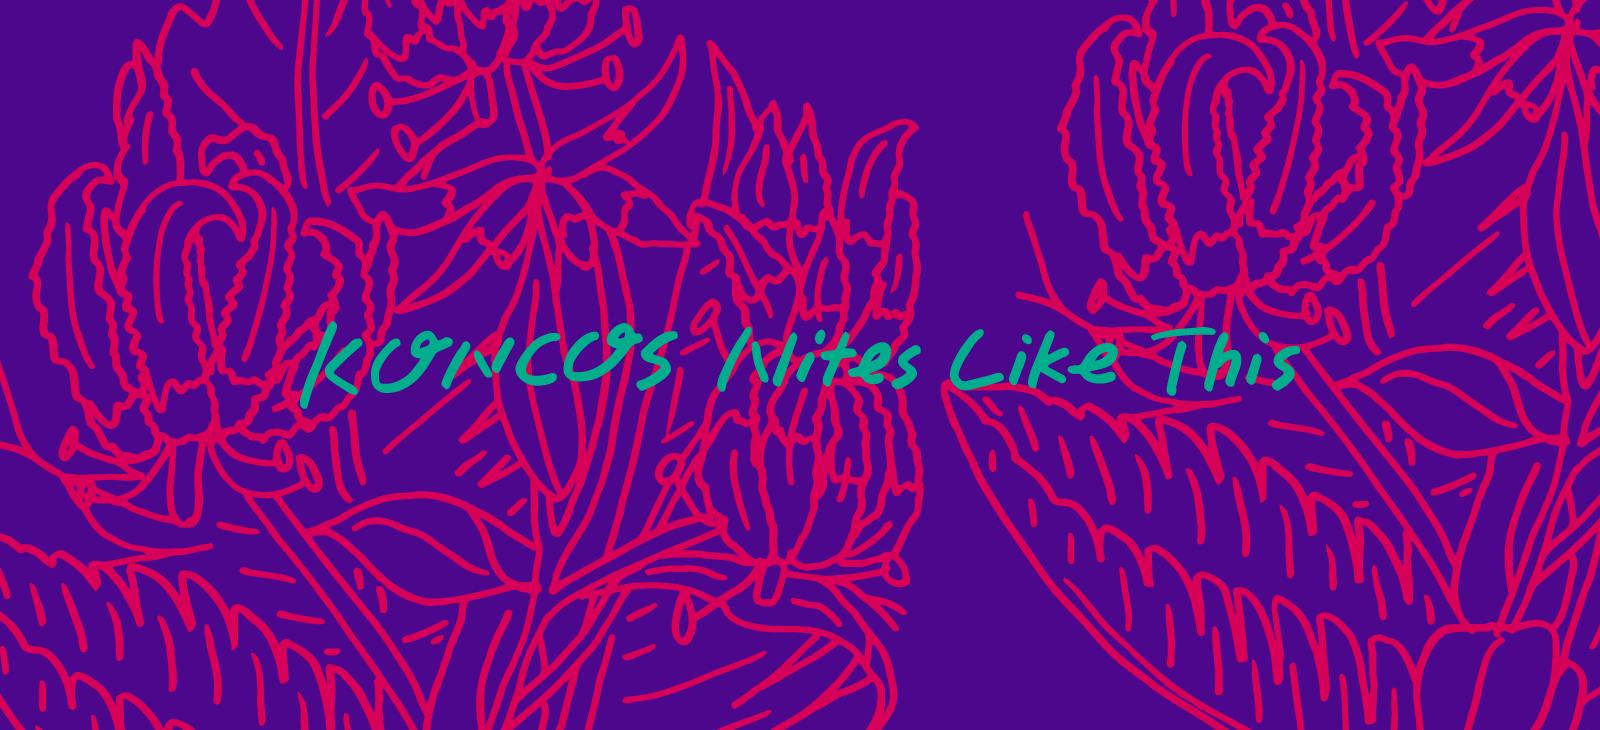 KONCOS | Nites Like This (George.MOP of HEAD Remix)